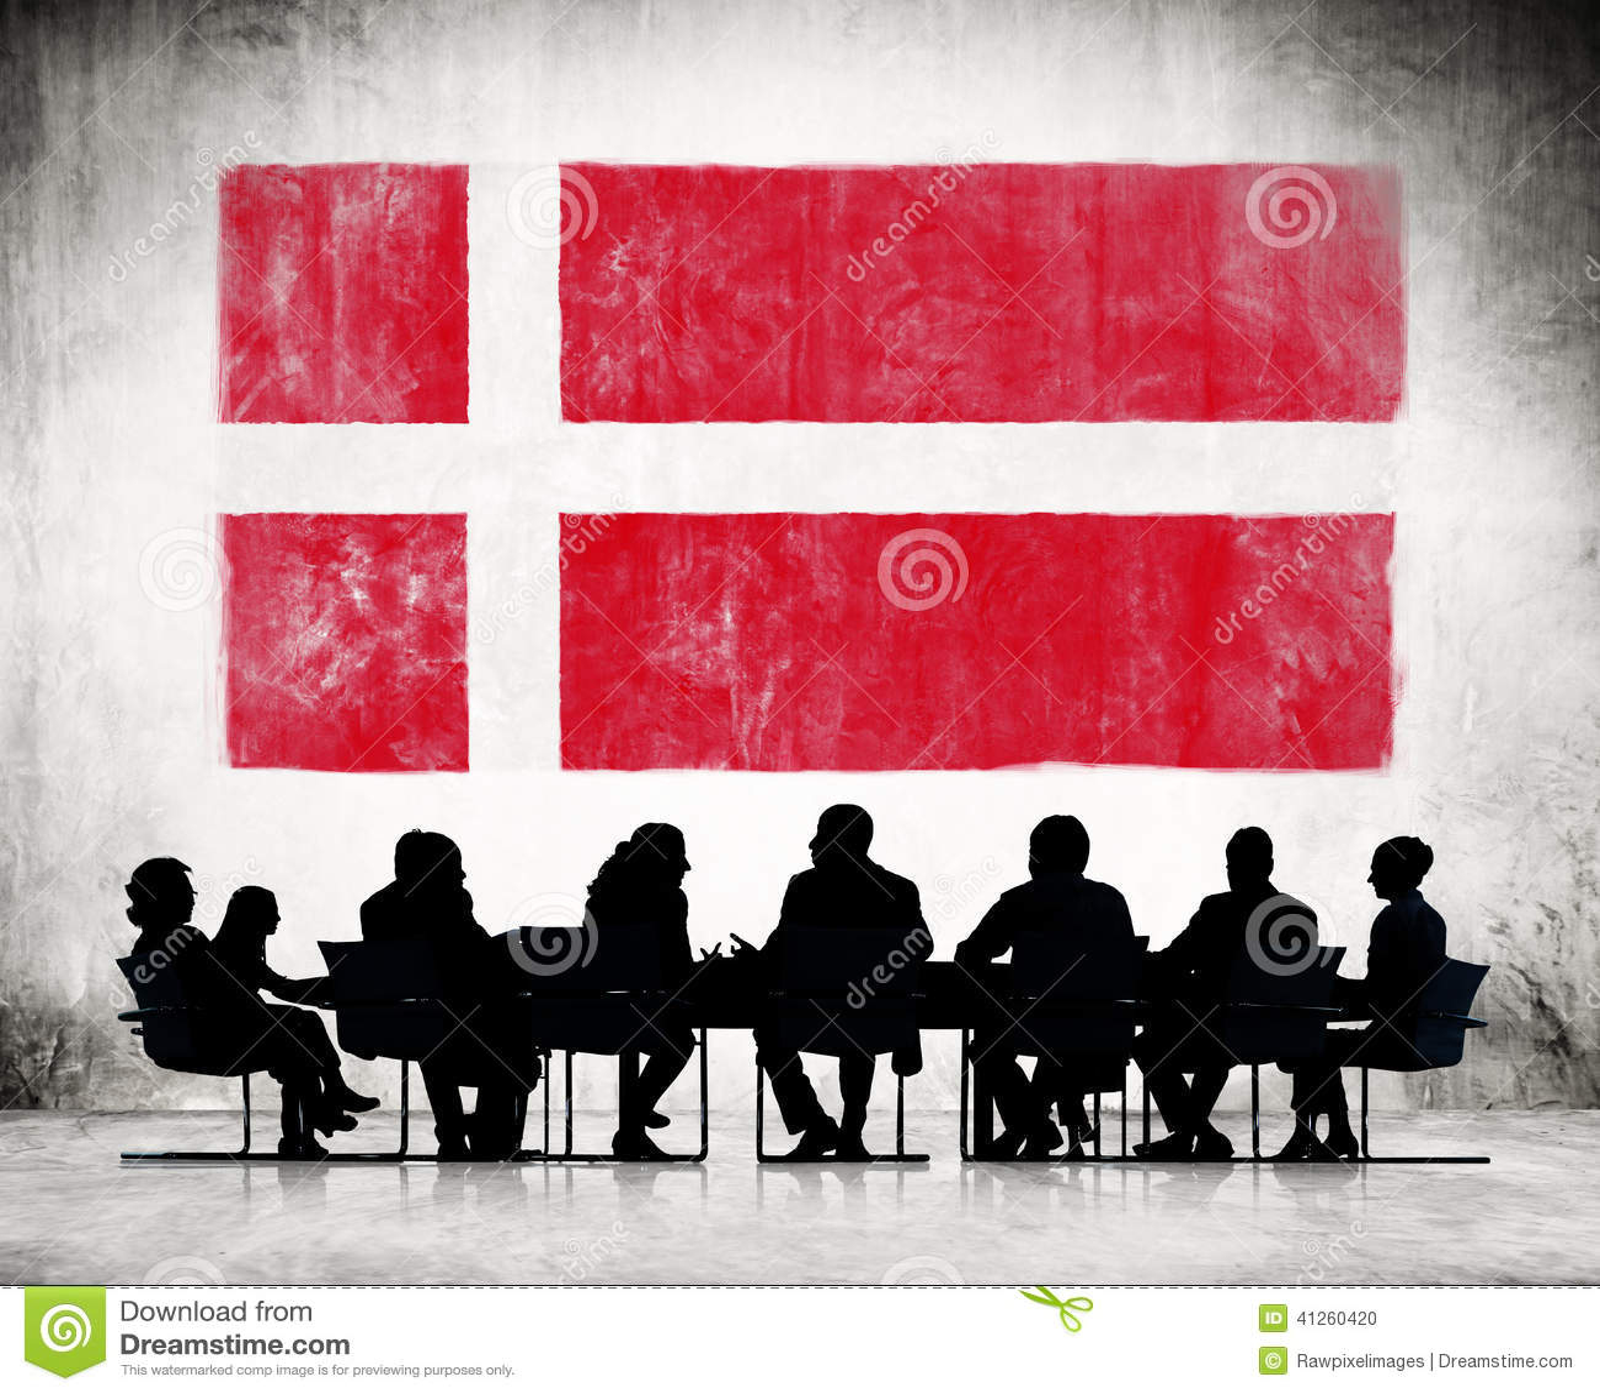 Textured Map Of Denmark, Stock Photo | CartoonDealer.com #82762356